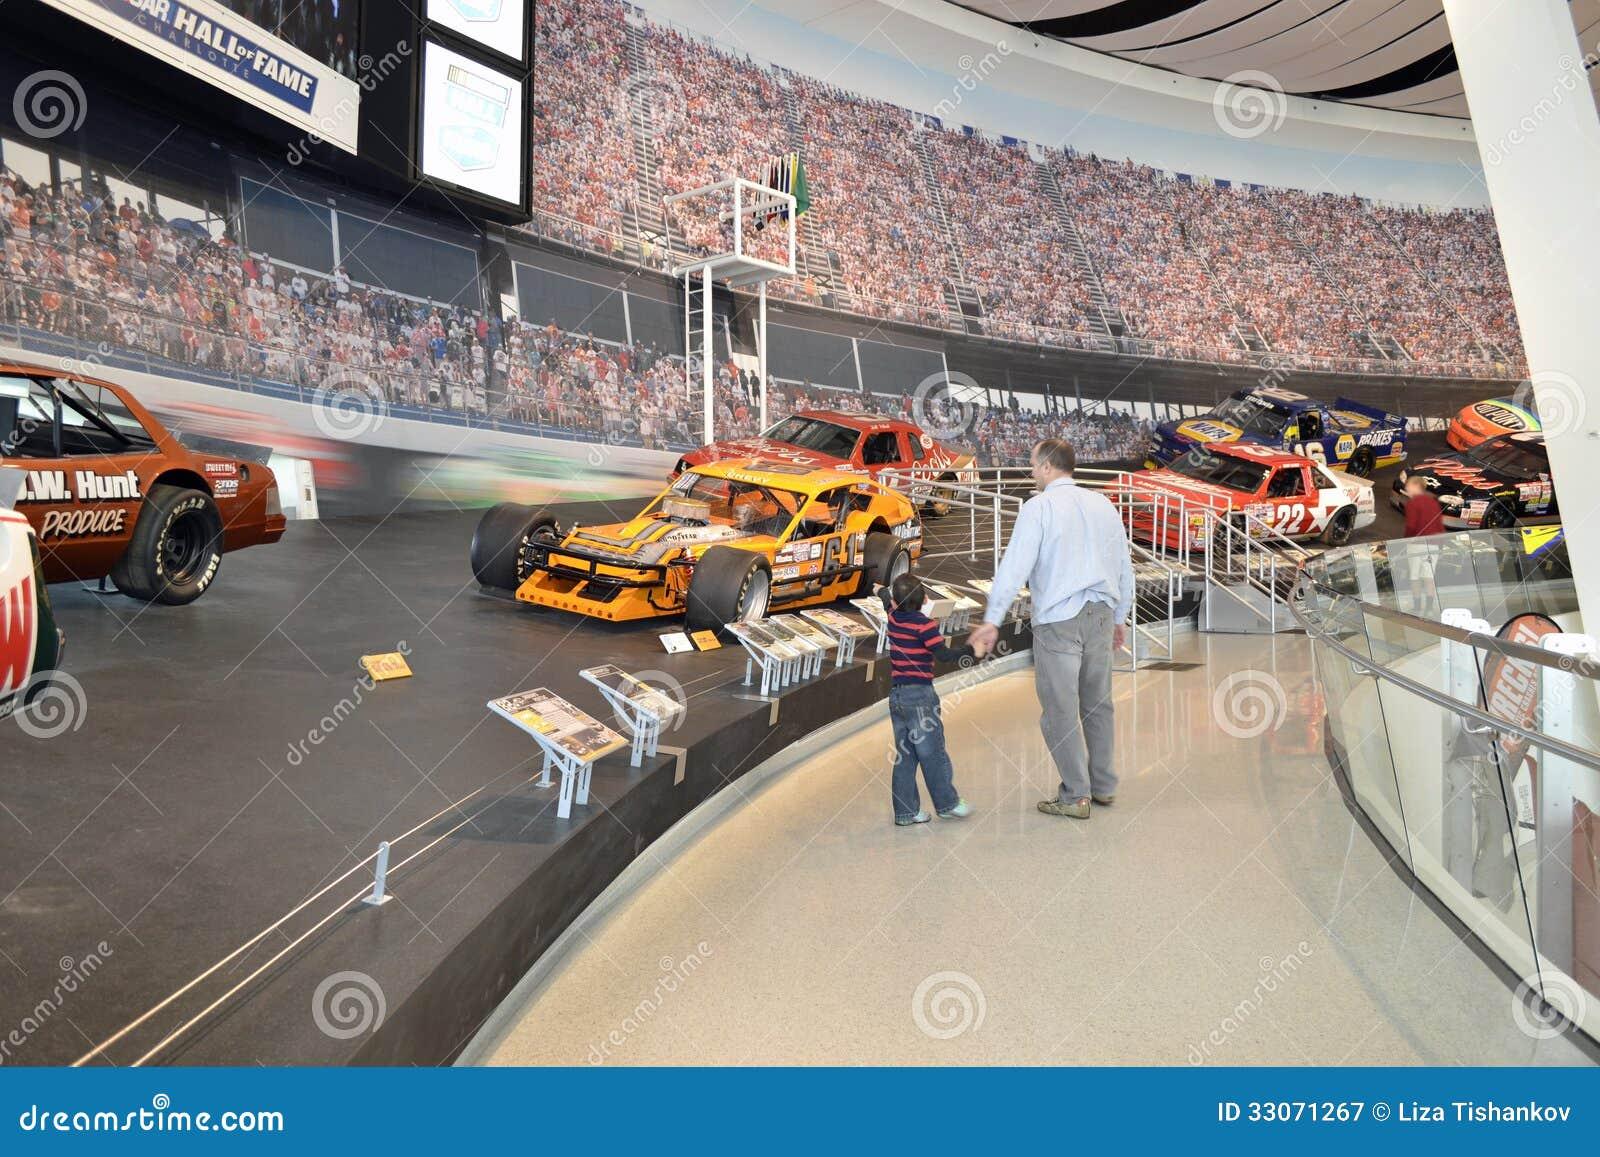 Race Car Museum In North Carolina